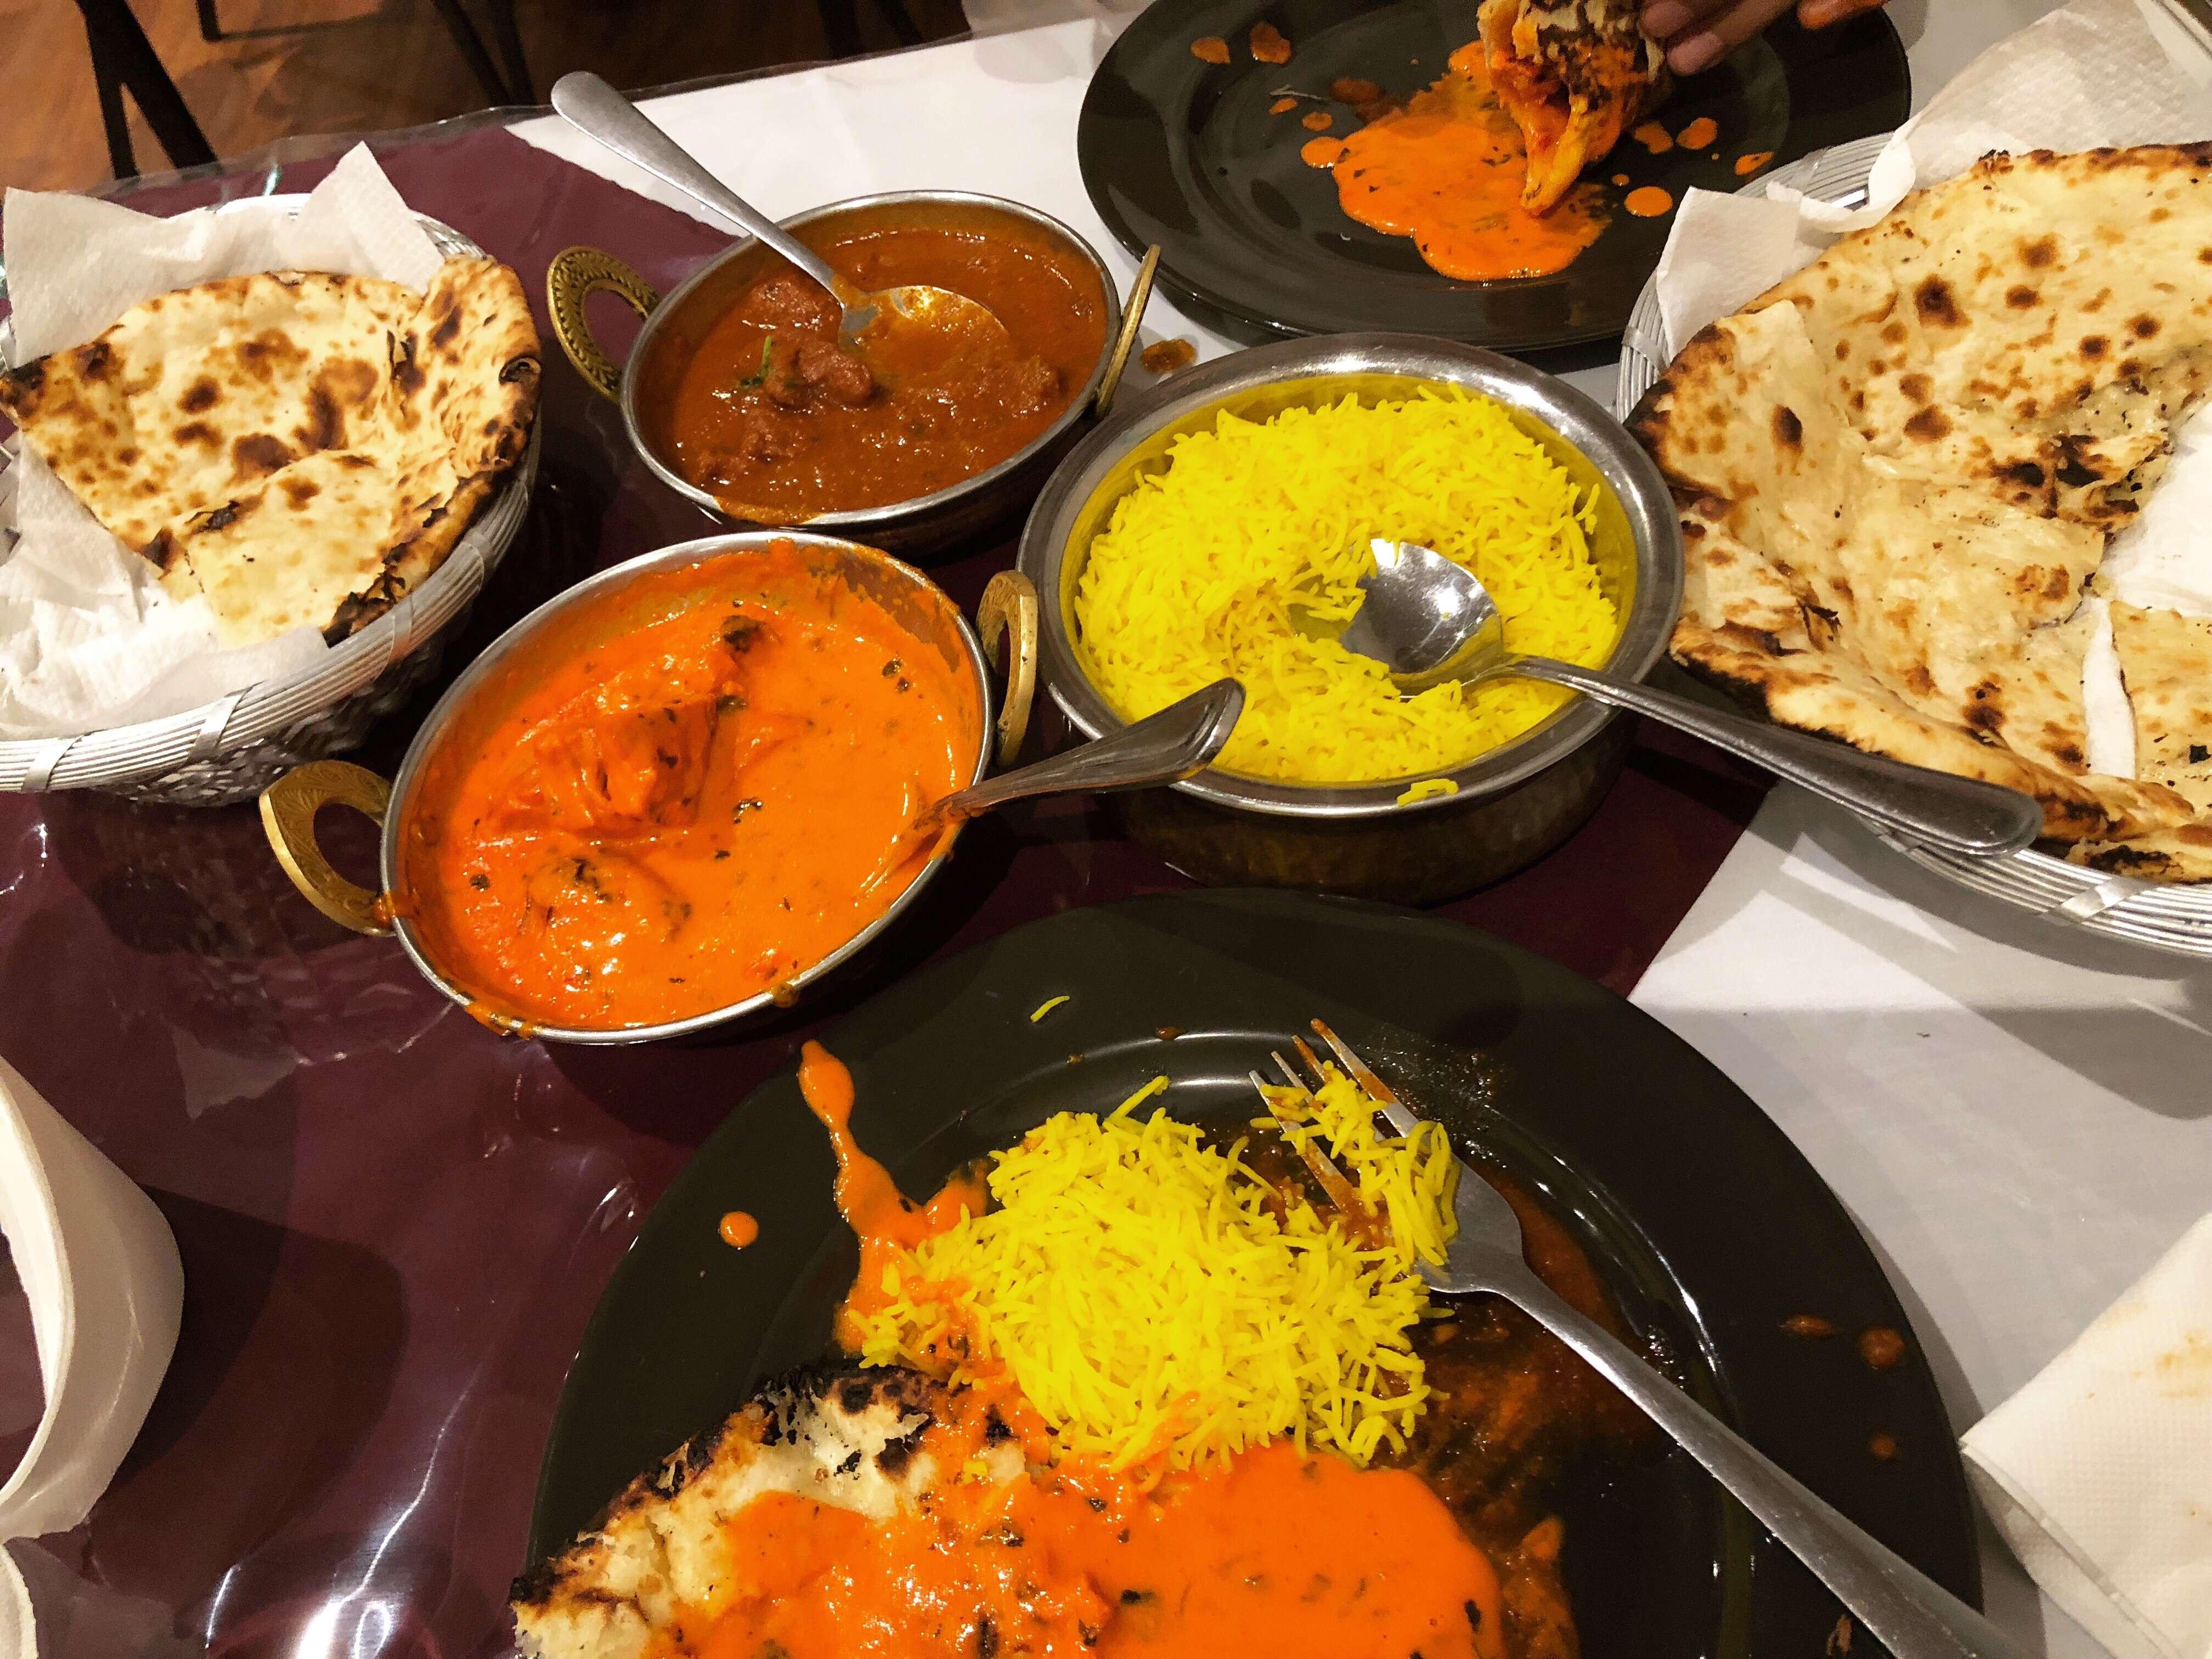 Shantis Indo-Lankan Restaurant | Shop 12, 166 Monier Road (corner Monier & Bellwood Road, Darra, Queensland 4076 | +61 7 3376 0454